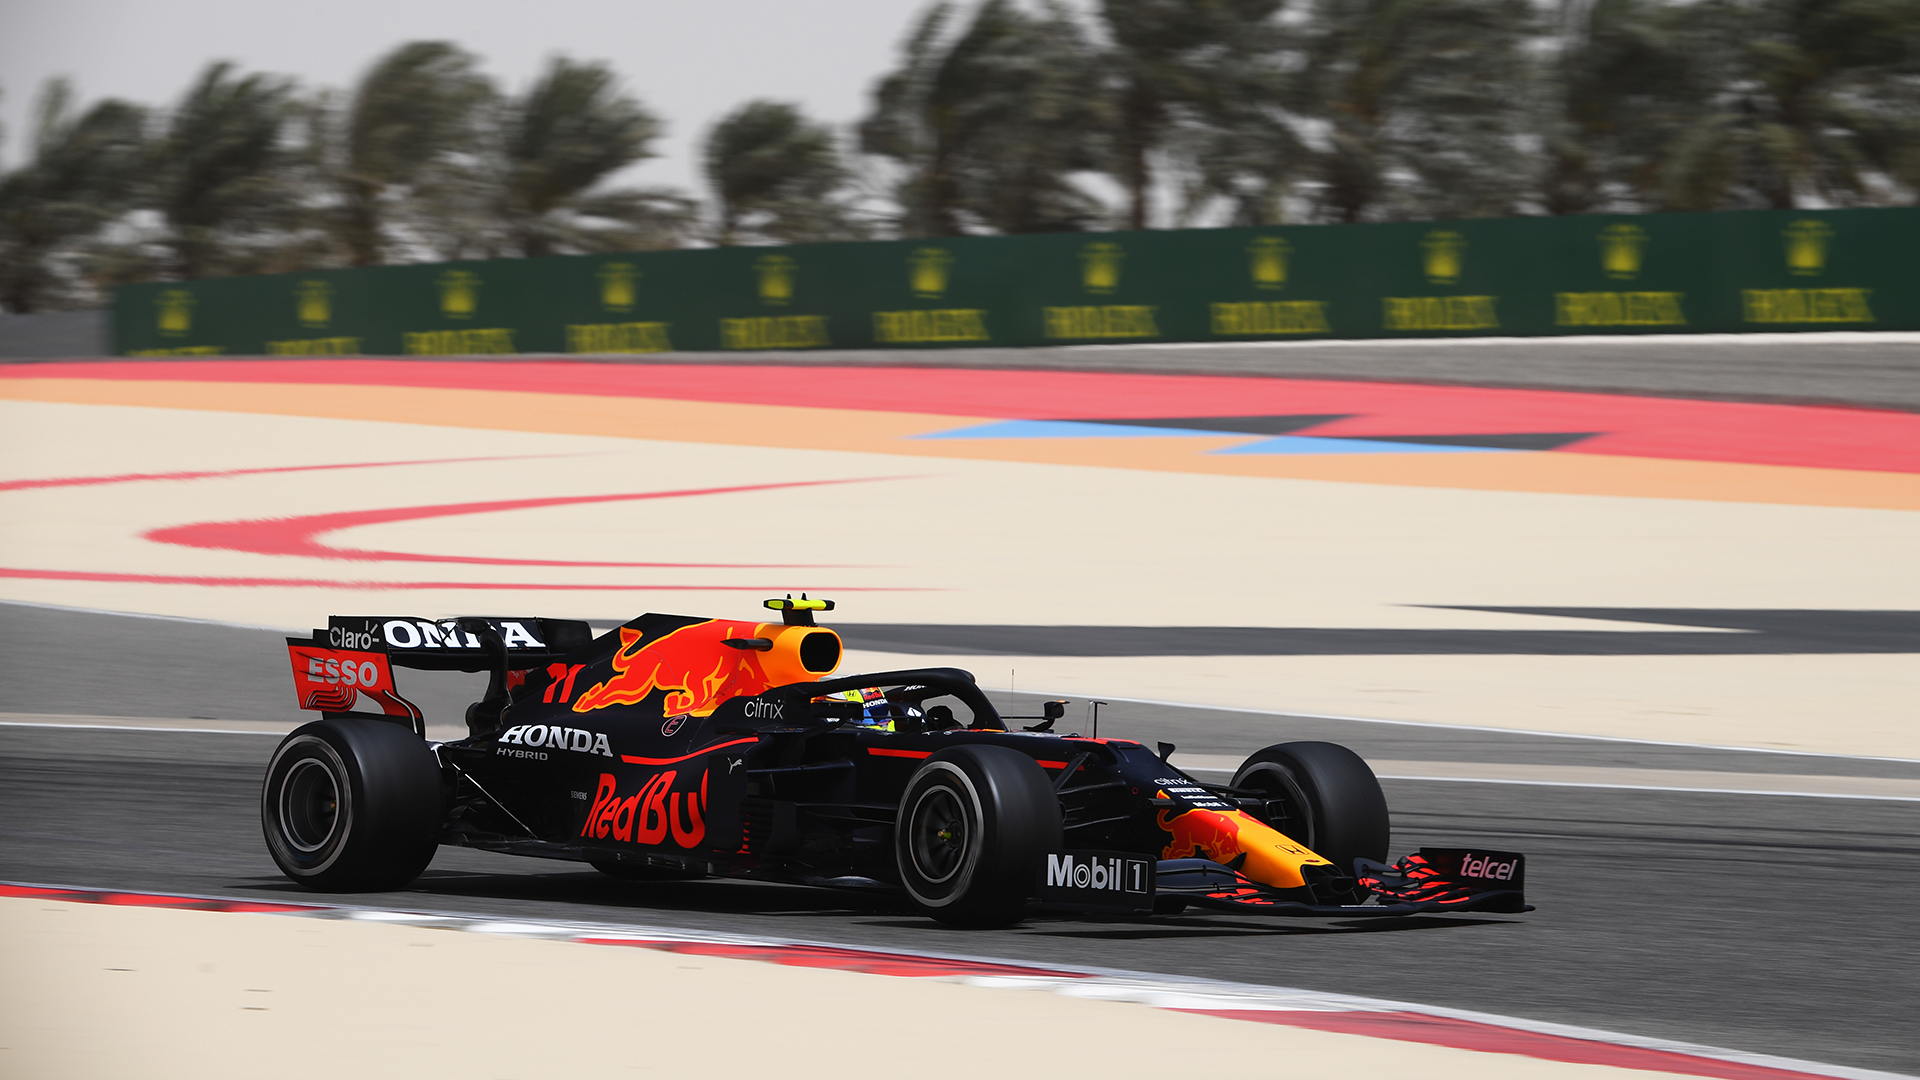 F1 Austria live stream — how to watch the Austrian Grand Prix online – Red Bull